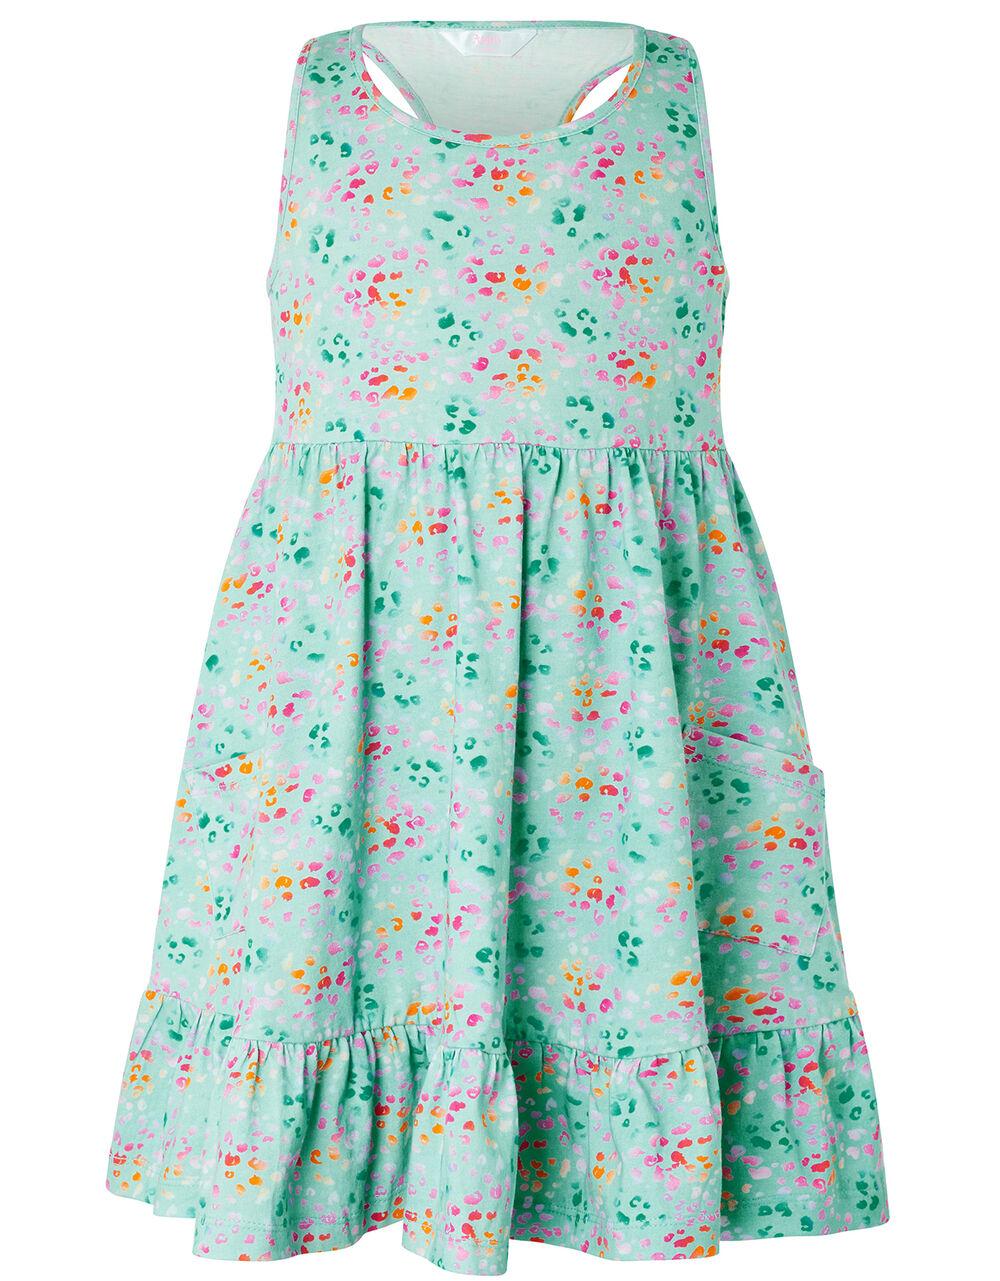 Ombre Animal Print Jersey Dress, Multi (BRIGHTS-MULTI), large